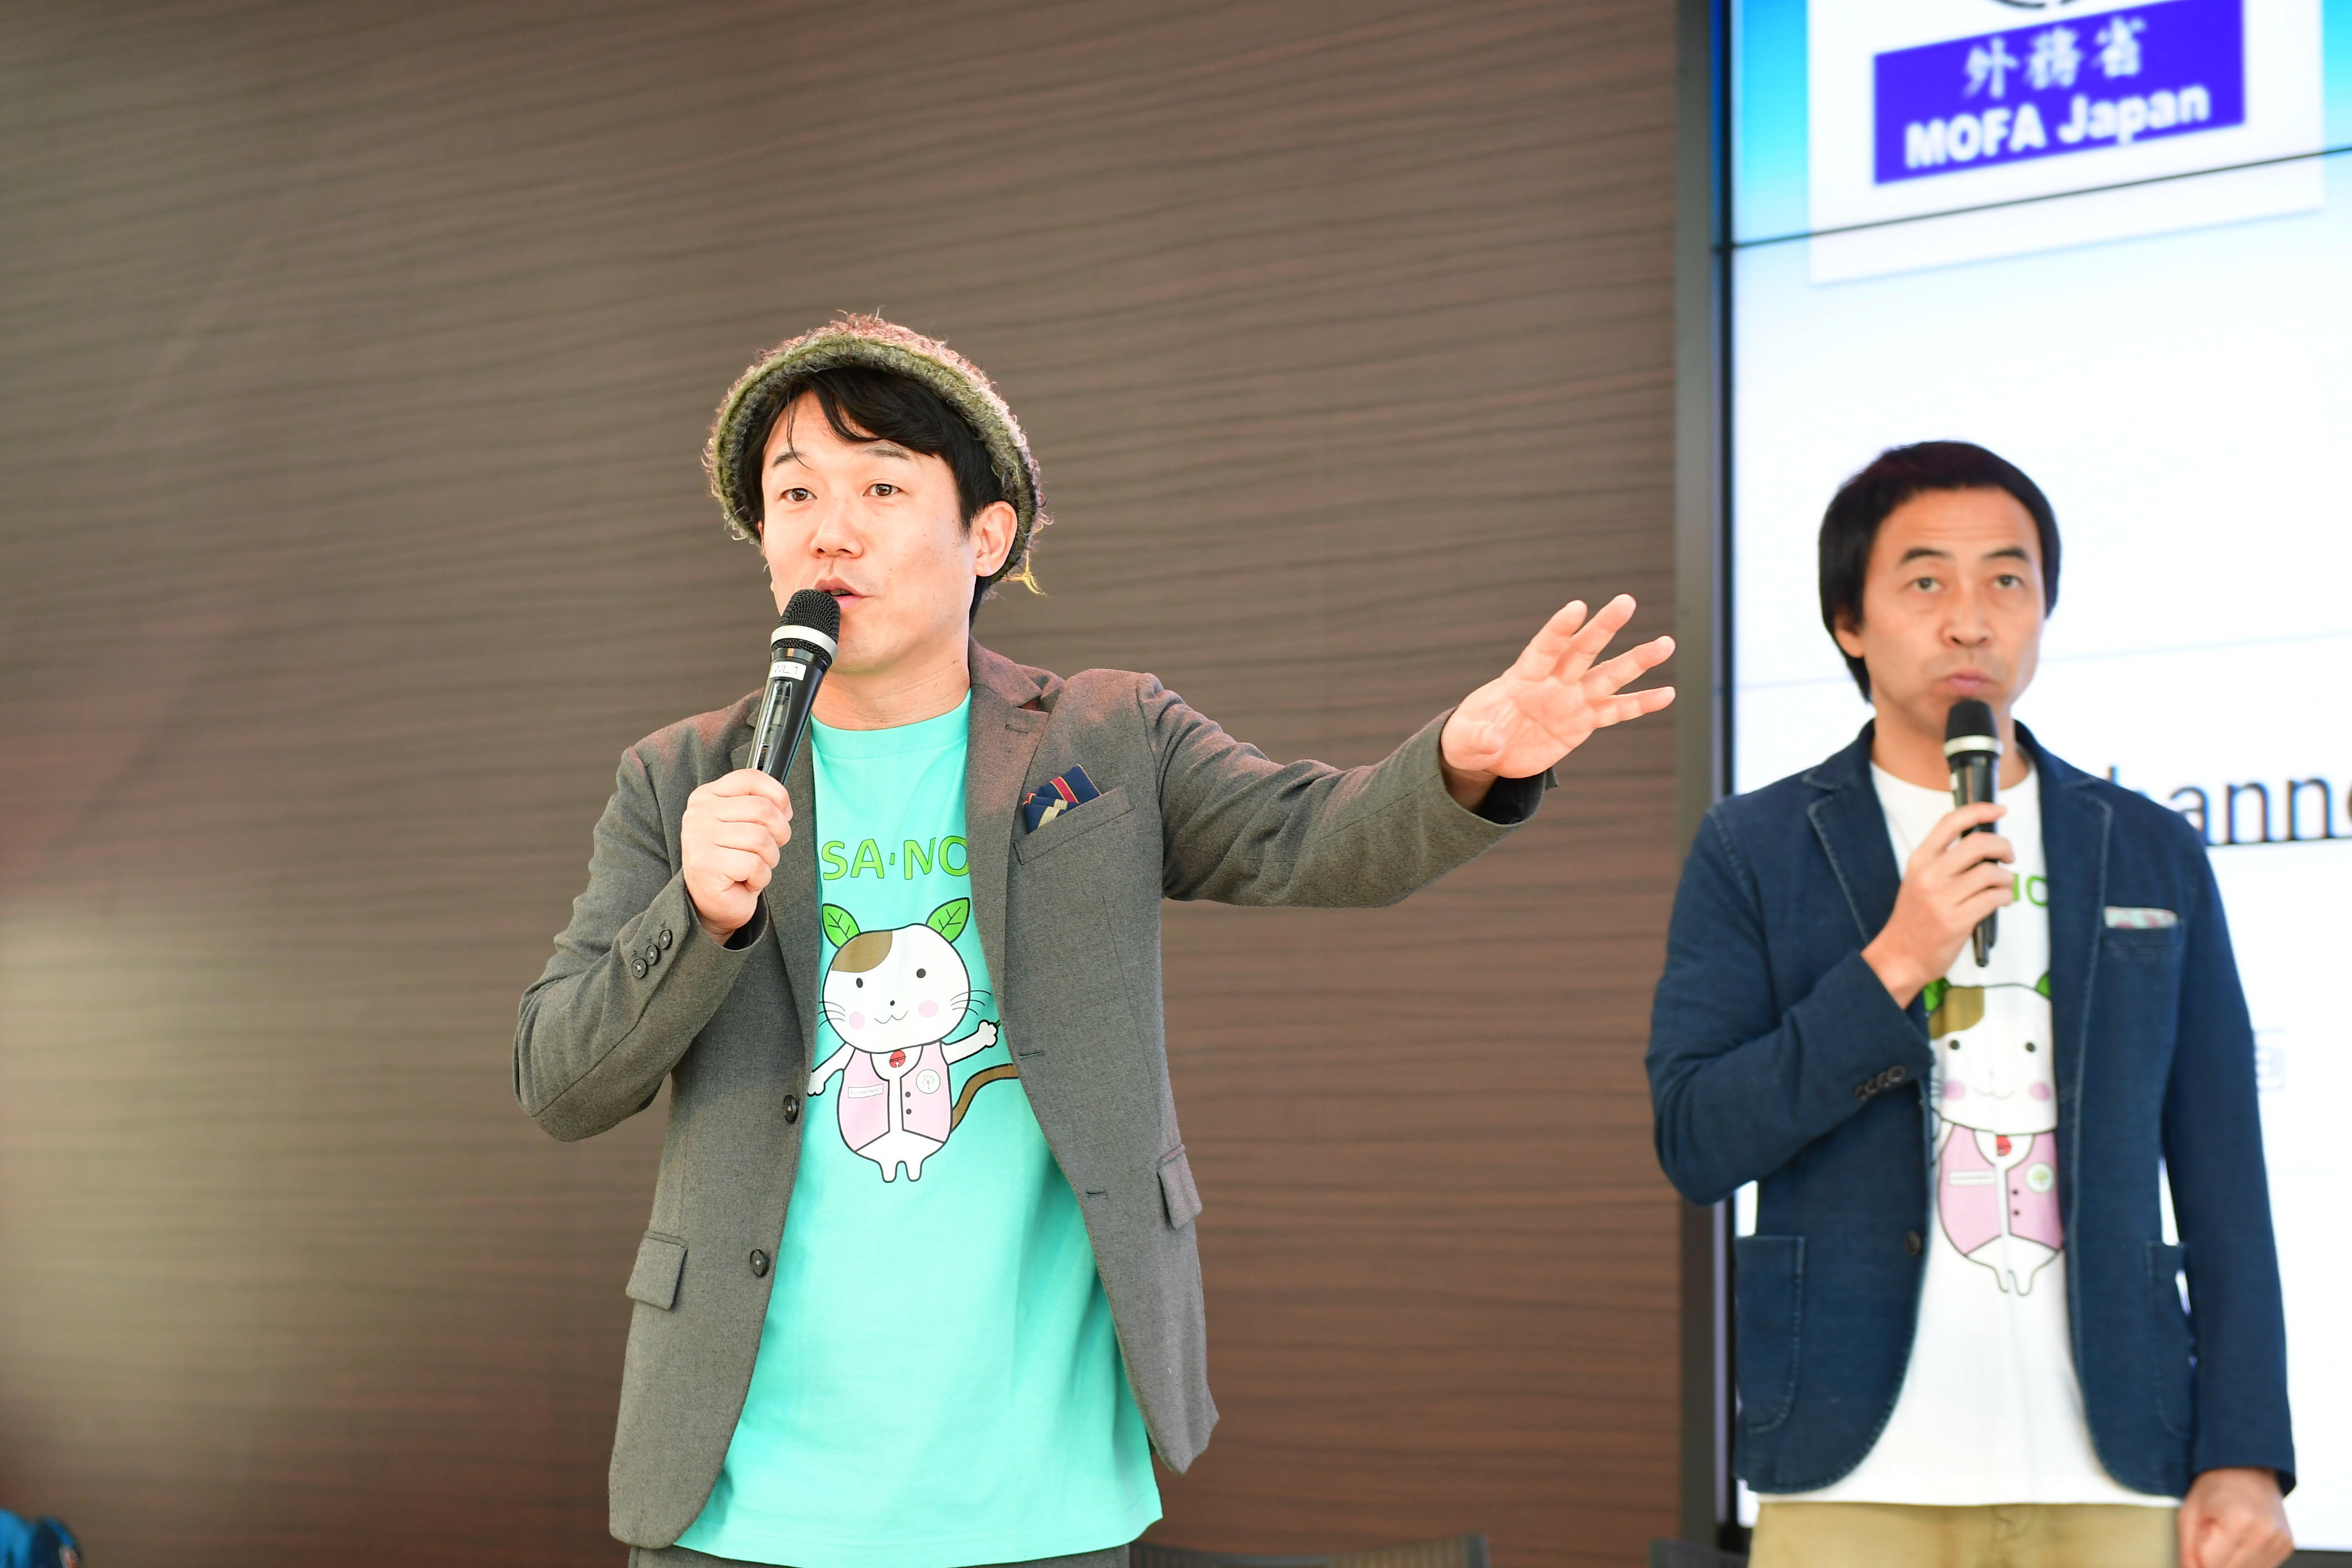 http://news.yoshimoto.co.jp/20190203131518-ed86e7733b6cbb75b645830703f8929887b74ec6.jpg